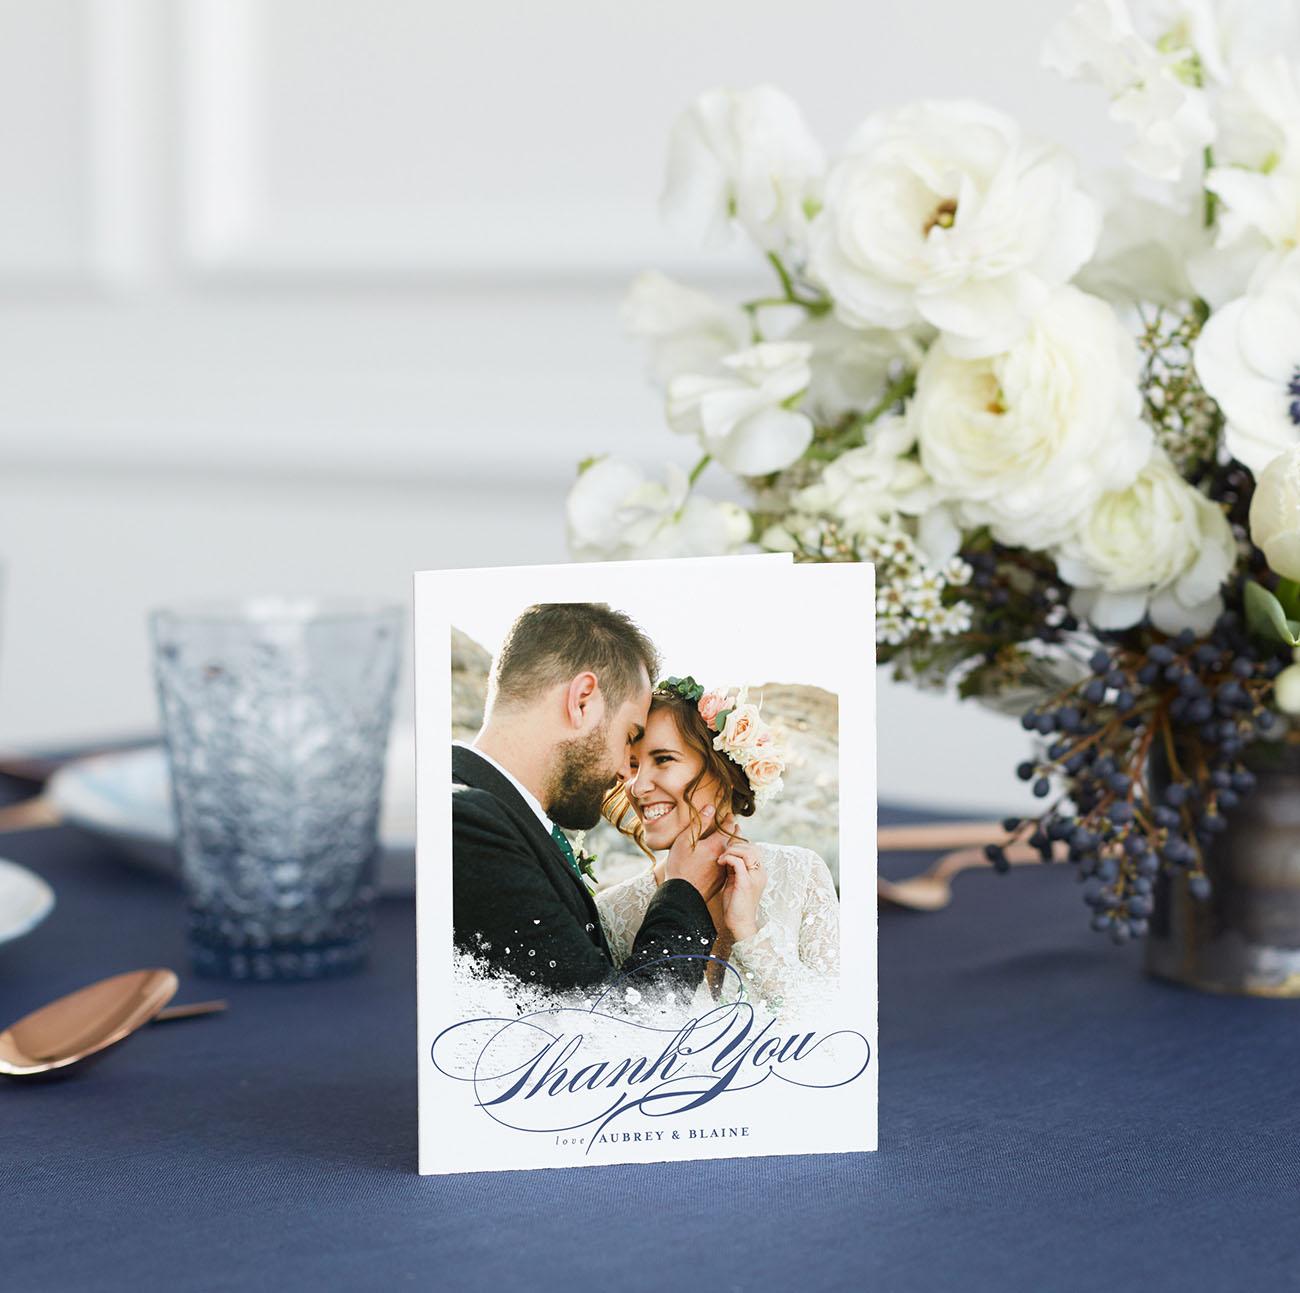 wedding thank you card wording